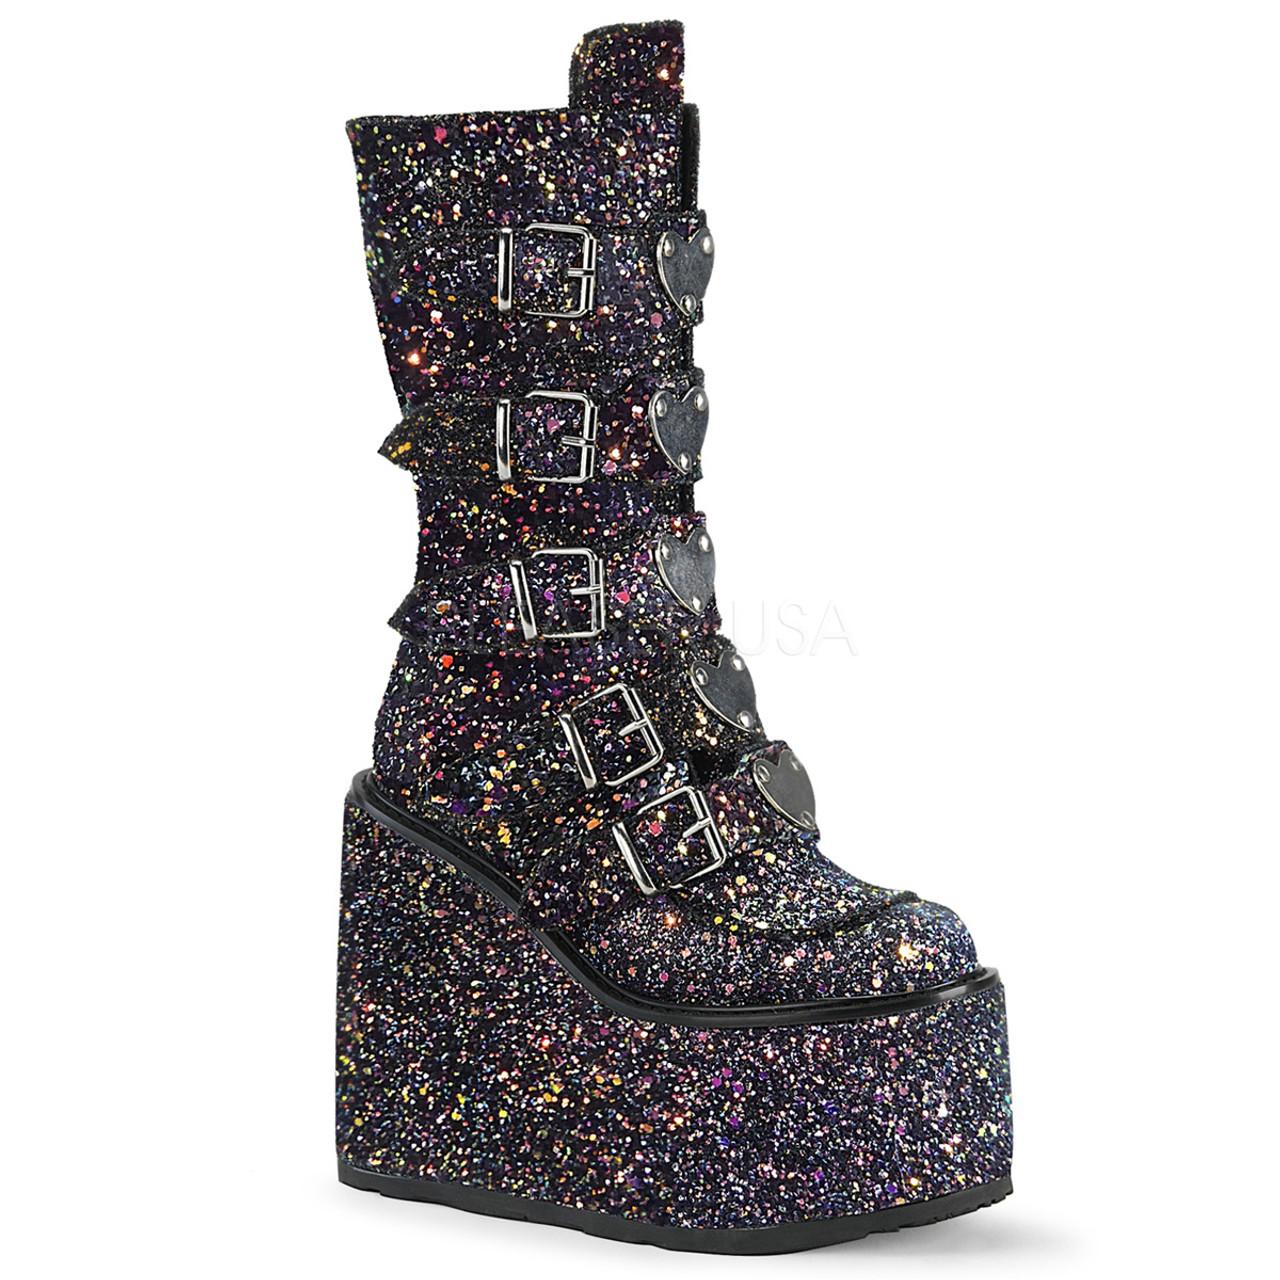 Black Glitter wedge buckle platform boots